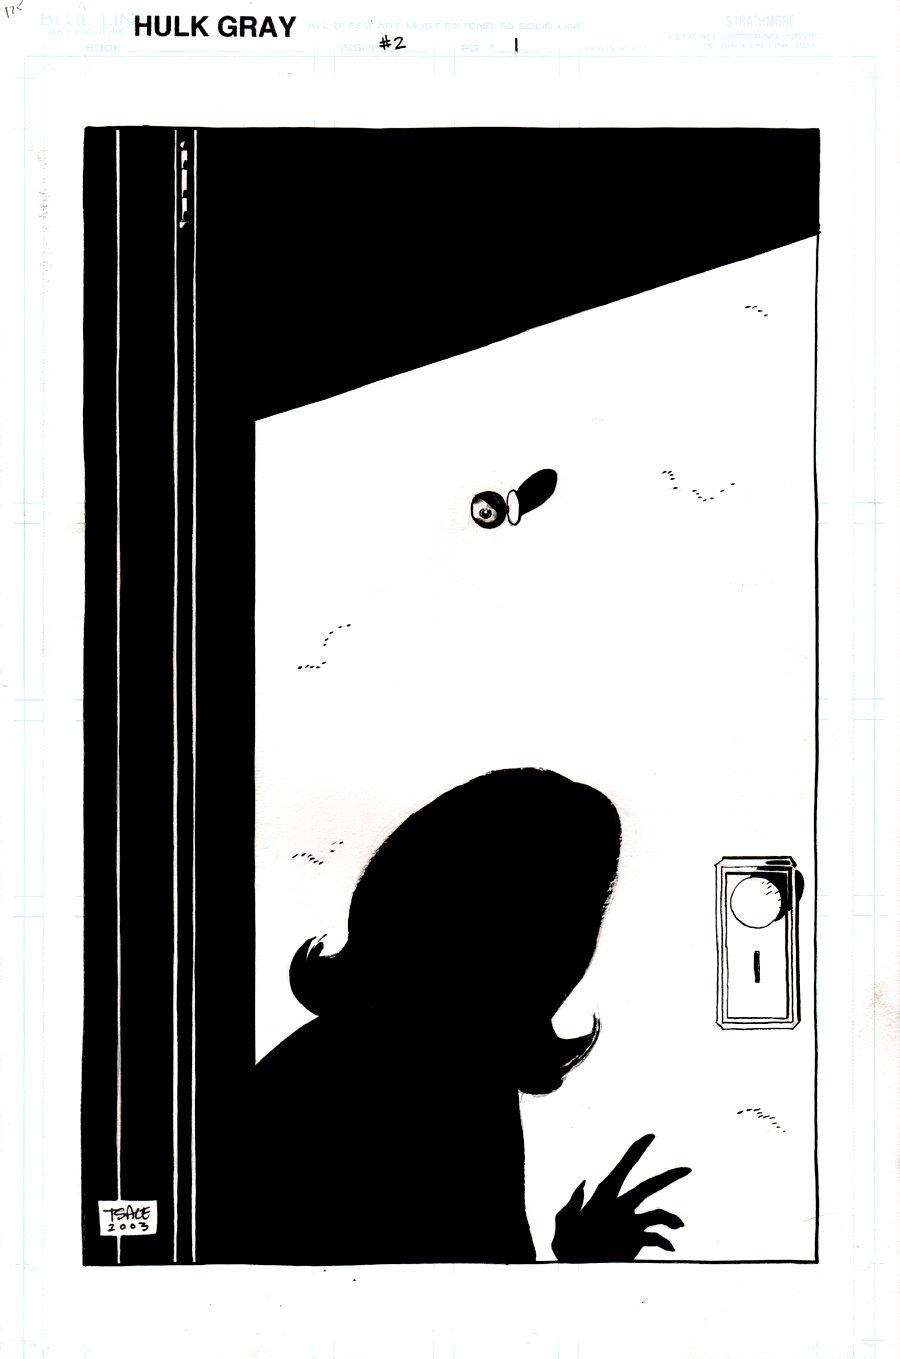 Hulk: Gray #2 p 1 SPLASH (BETTY SEES HULK THROUGH DOOR PEEP HOLE!) 2003